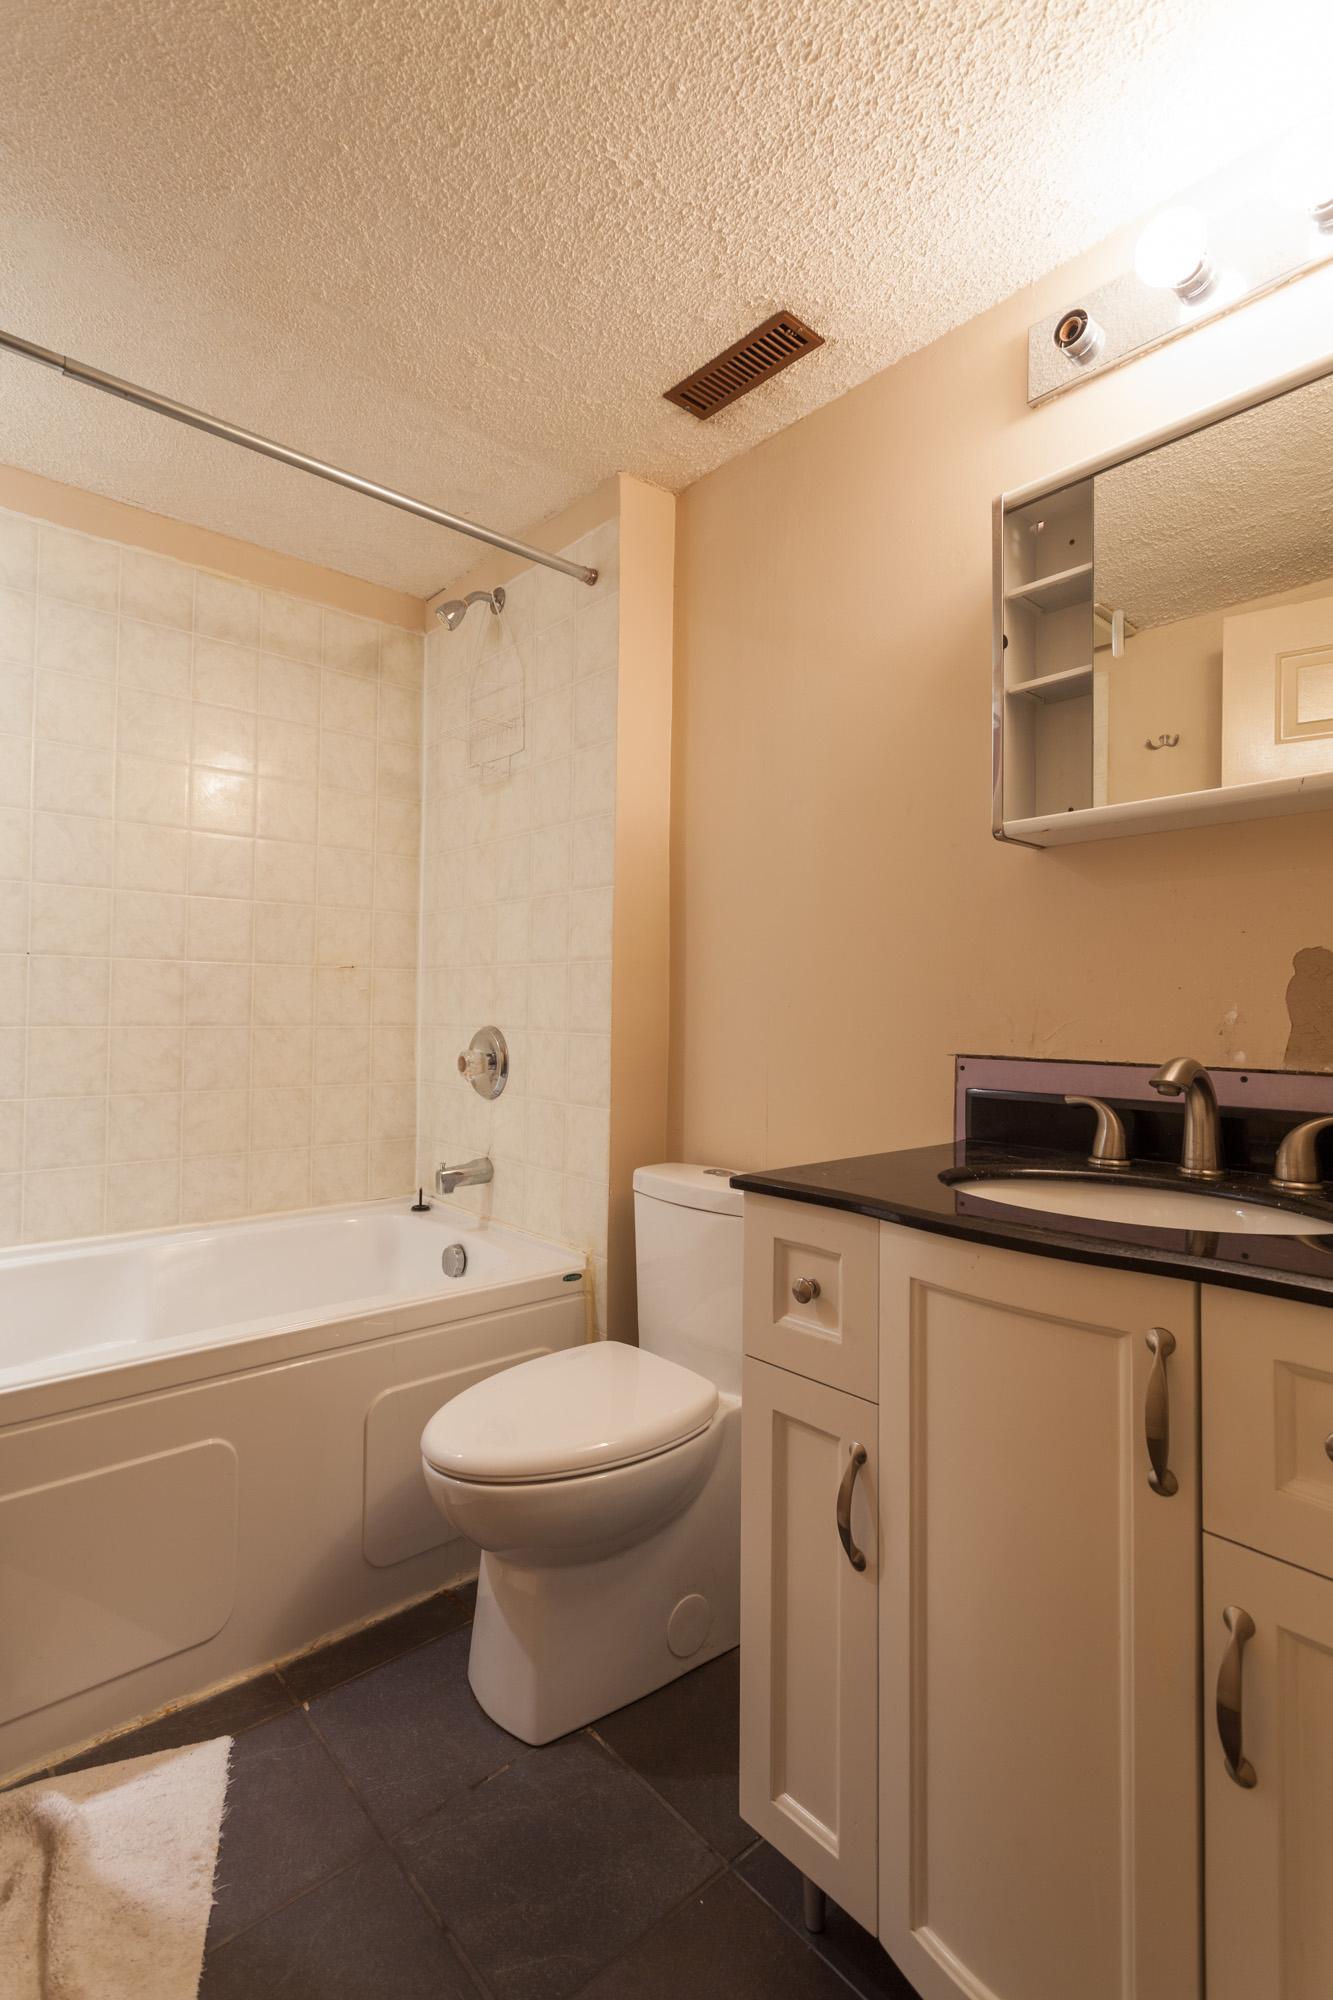 CK__bathroom.jpg